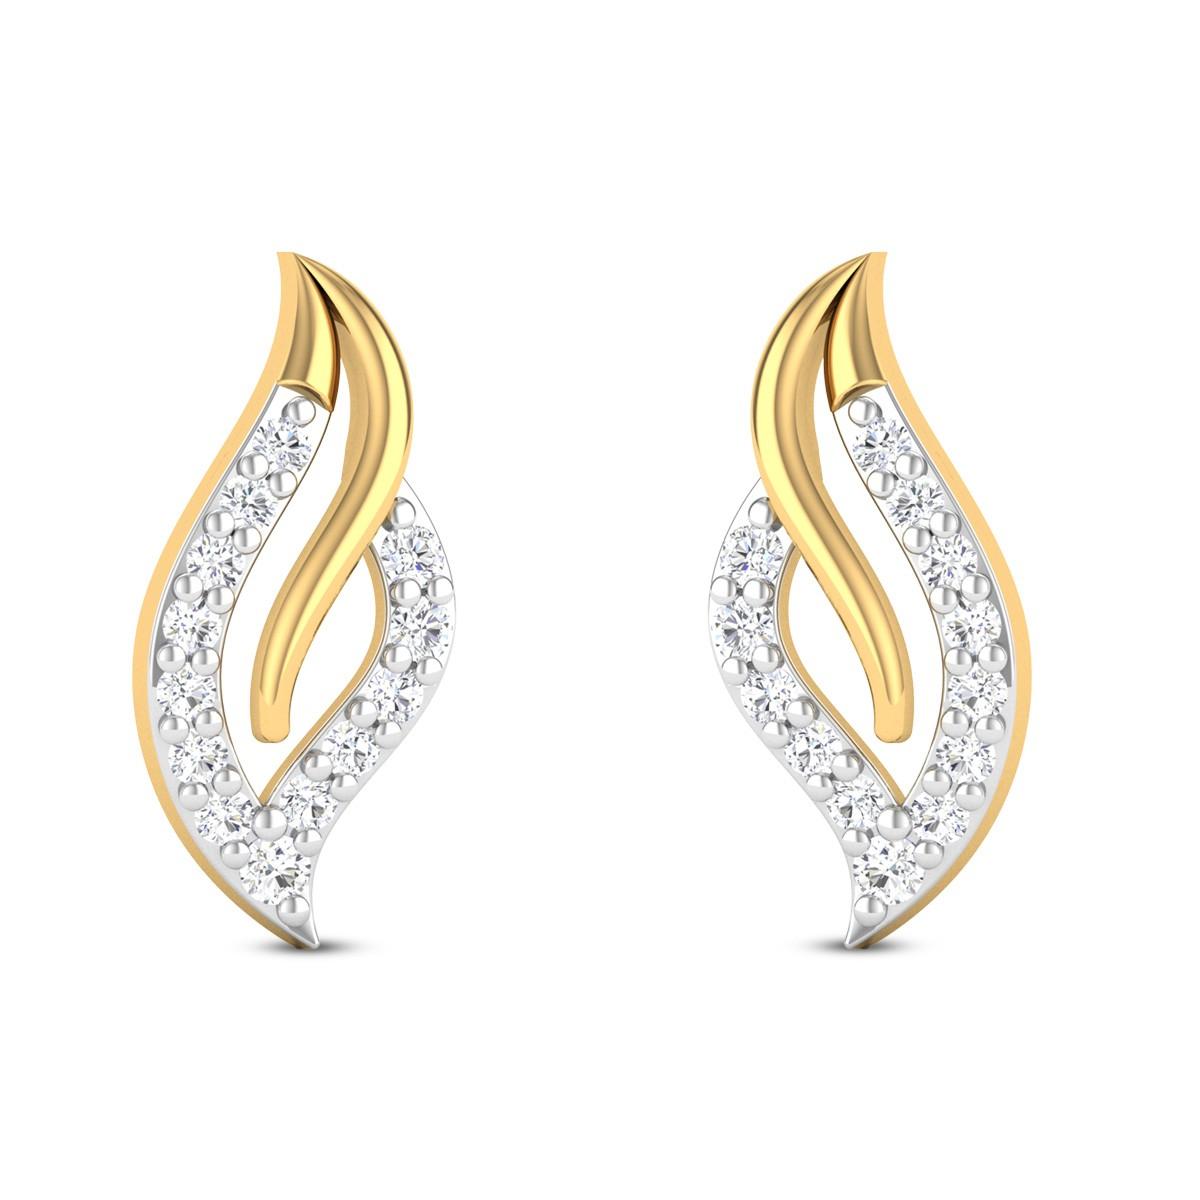 Catherine Diamond Earrings